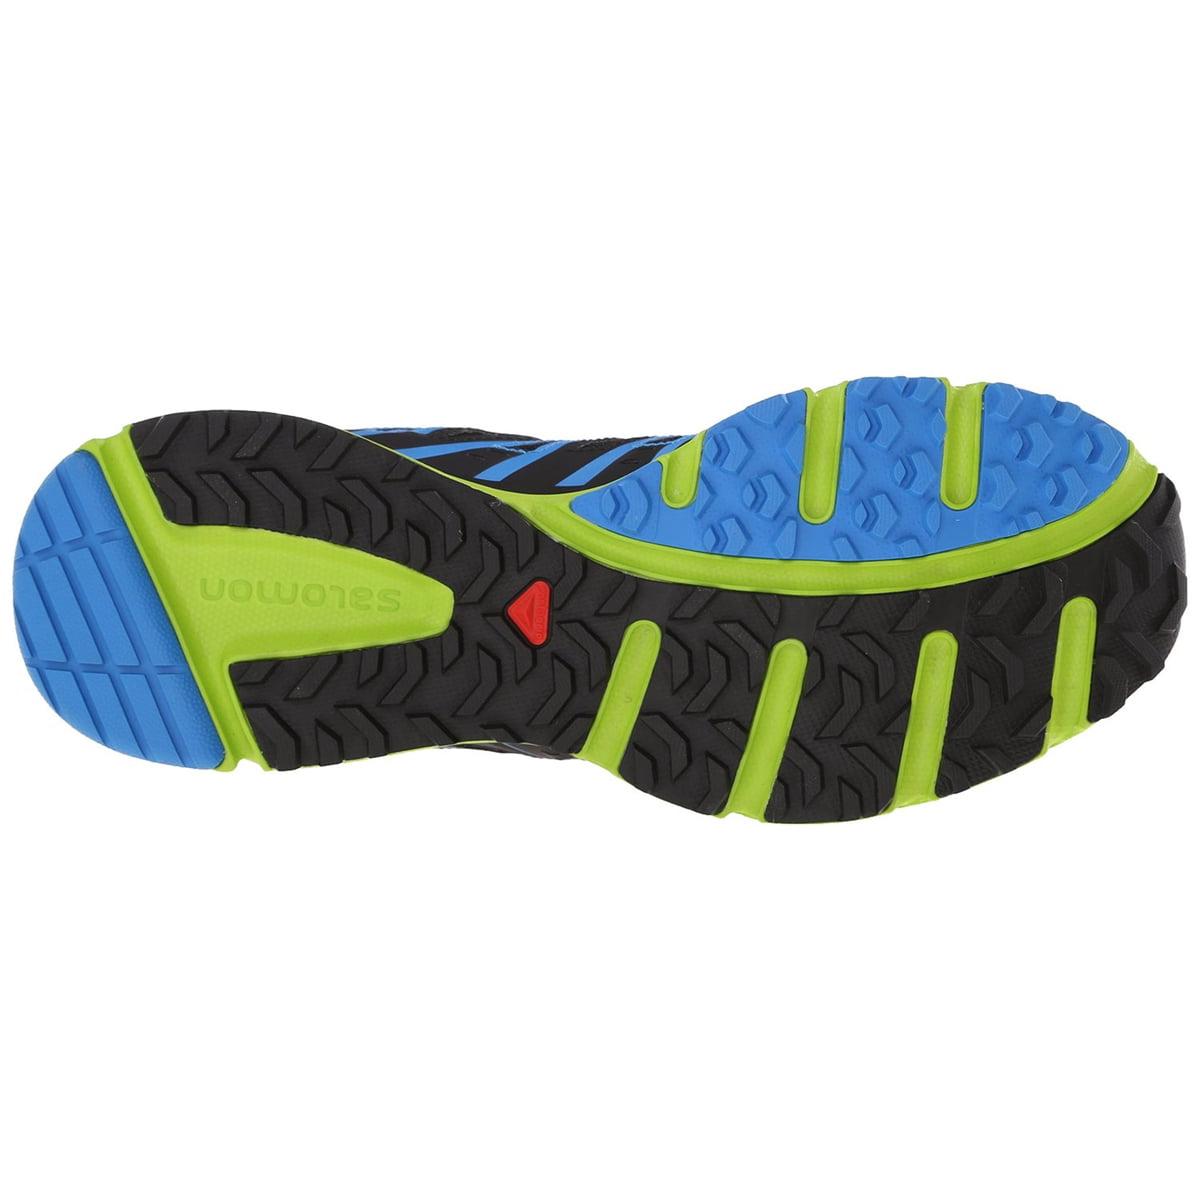 Salomon Men X-Mission 3 Trail Running Shoes